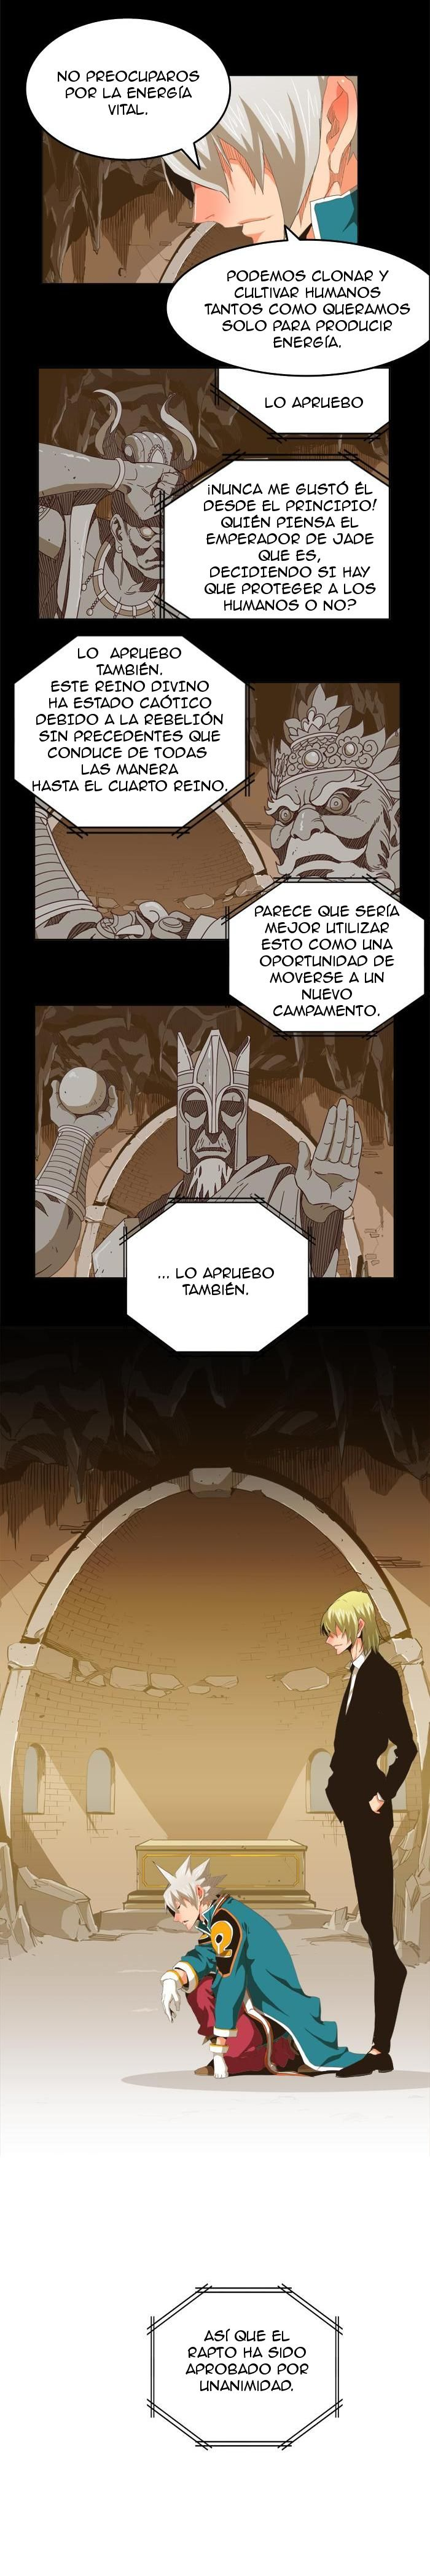 http://c5.ninemanga.com/es_manga/pic2/37/485/490273/33d8e6a4225d77ae914dff110feef000.jpg Page 3